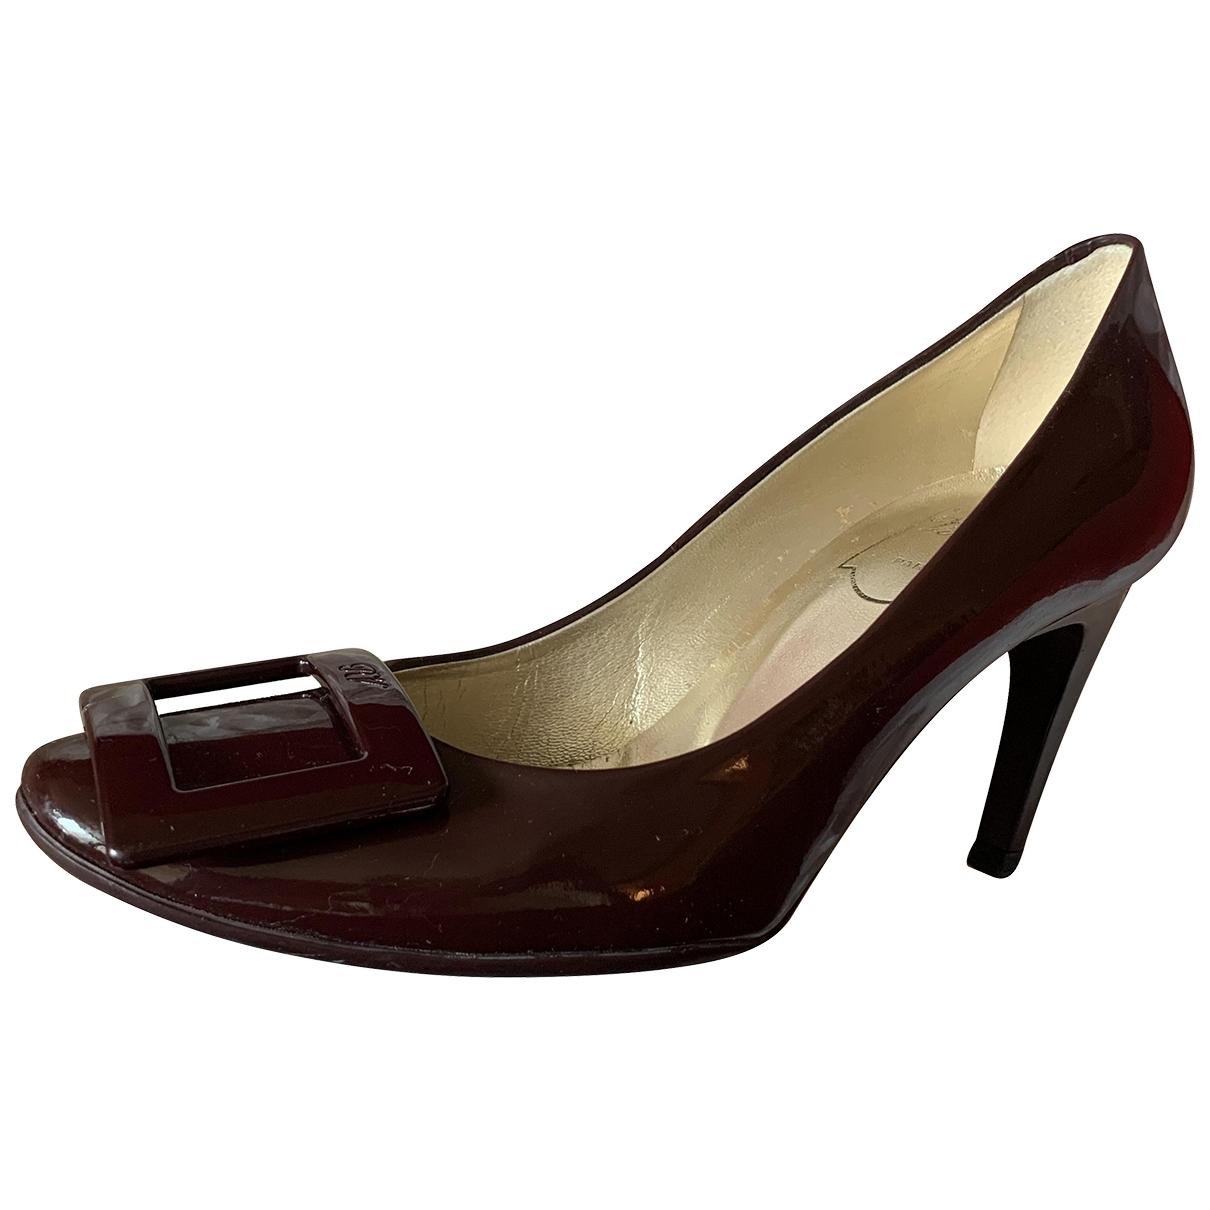 Roger Vivier Trompette Burgundy Leather Heels for Women 34 EU